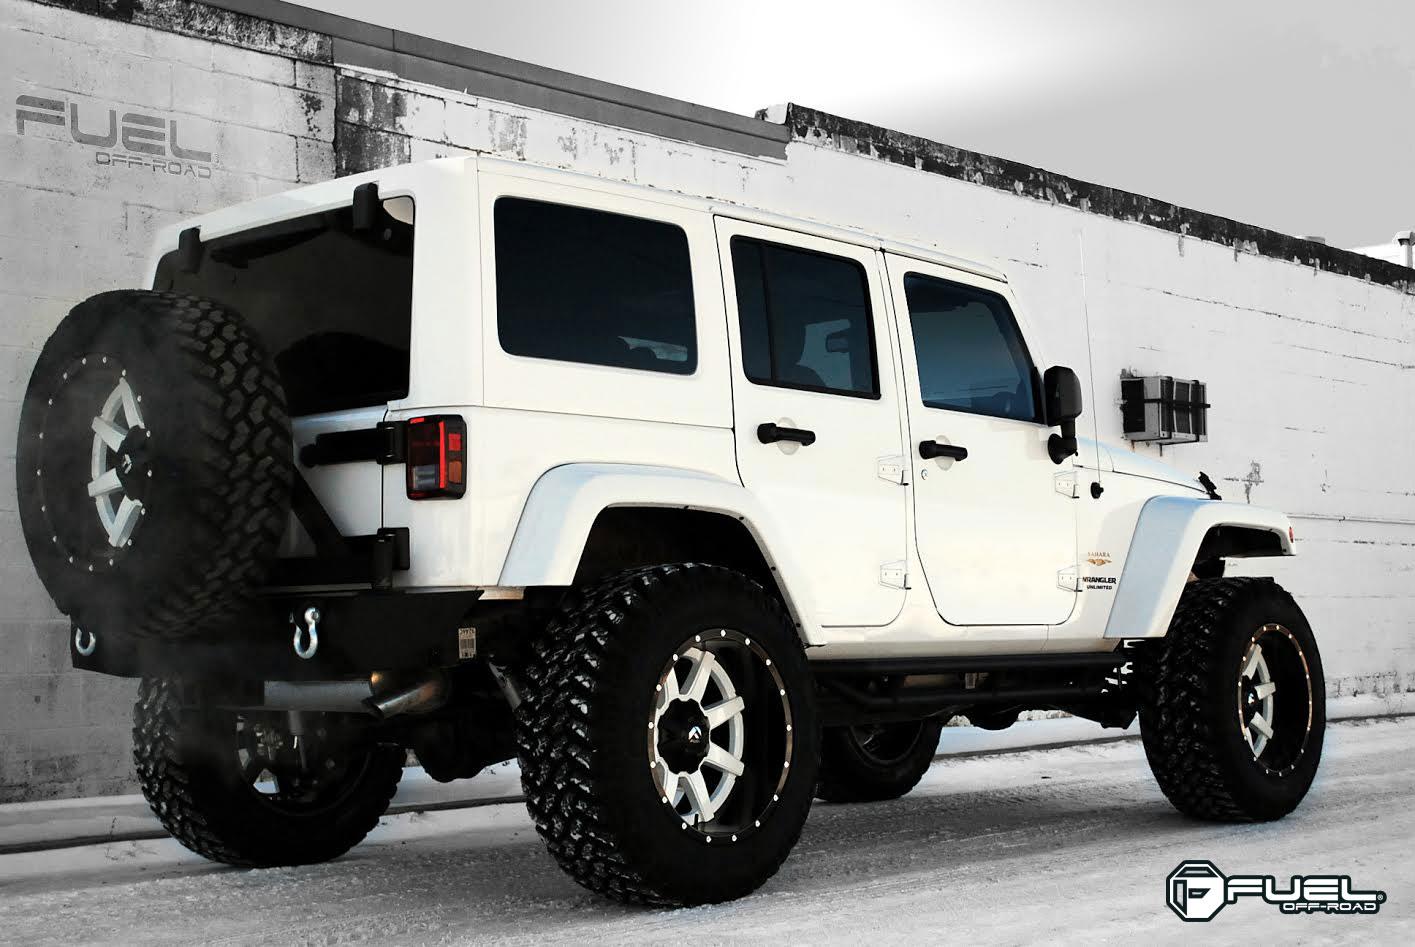 Jeep Wrangler Maverick - D261 Gallery - MHT Wheels Inc.